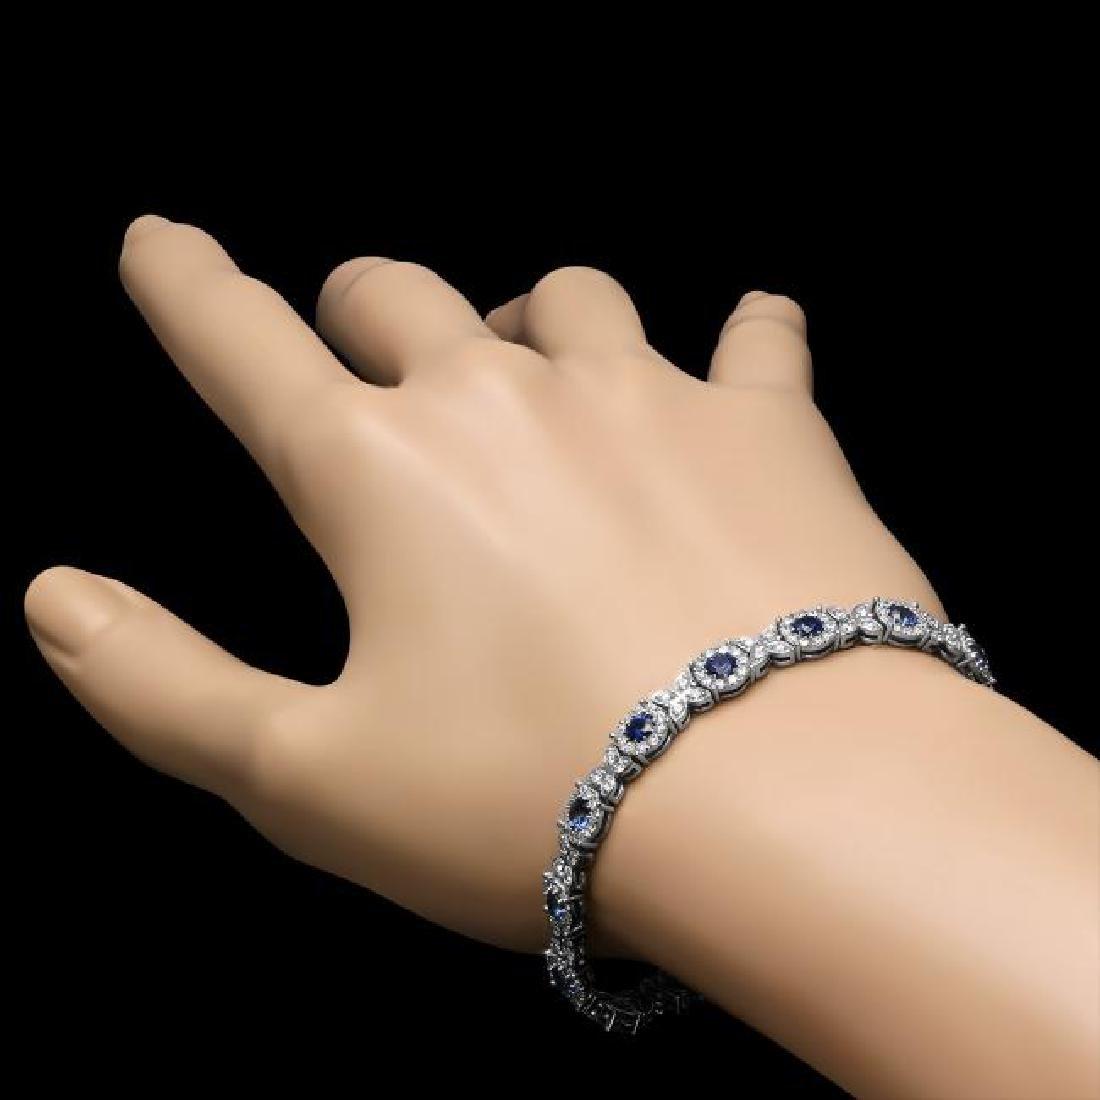 14K Gold 5.69ct Sapphire 3.88ct Diamond Bracelet - 3